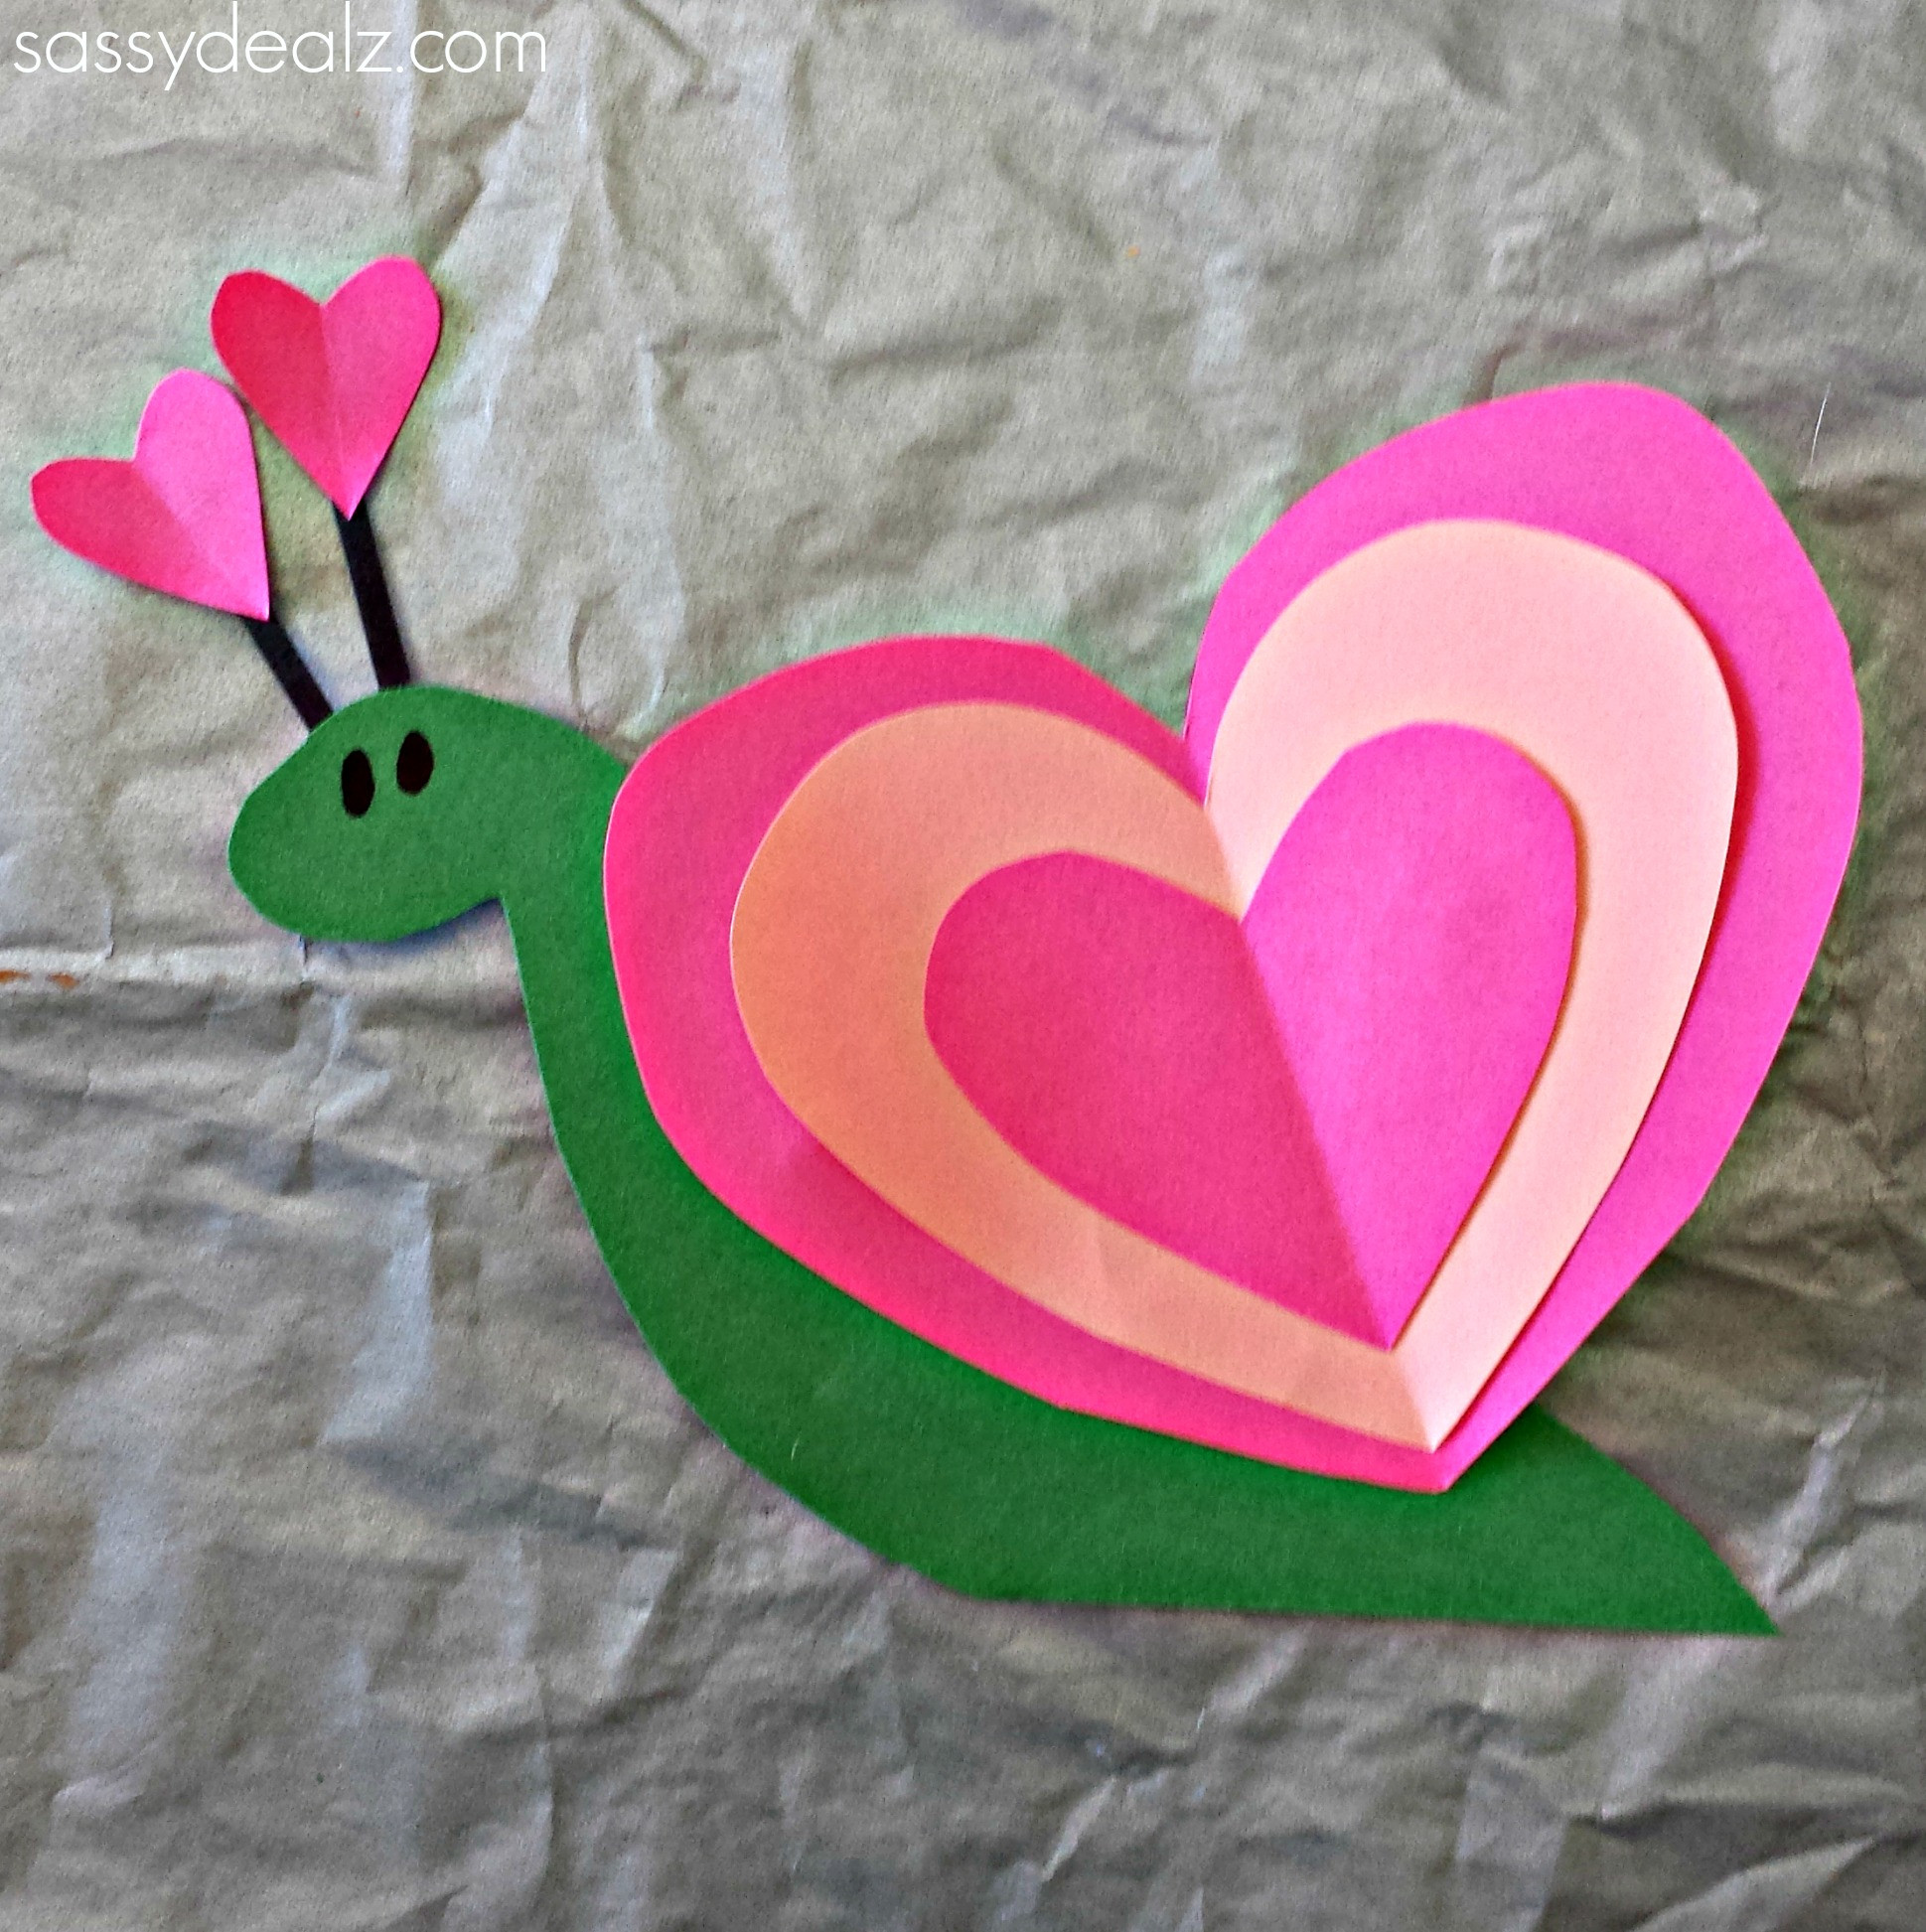 Heart Craft Ideas For Preschoolers  Heart Snail Craft For Kids Valentine Art Project